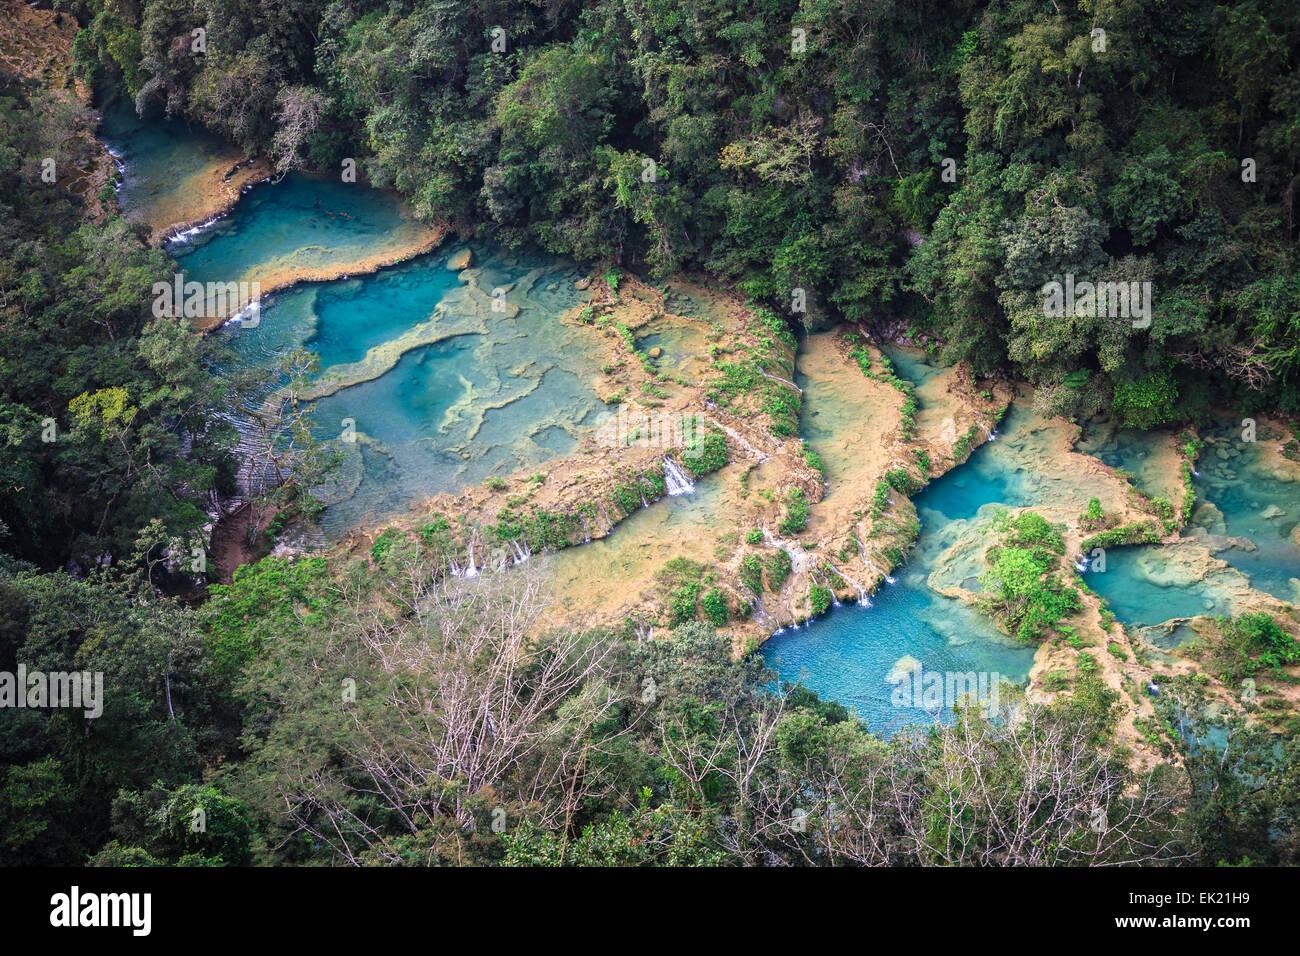 Semuc champay a natural aqua park in Guatemala - Stock Image